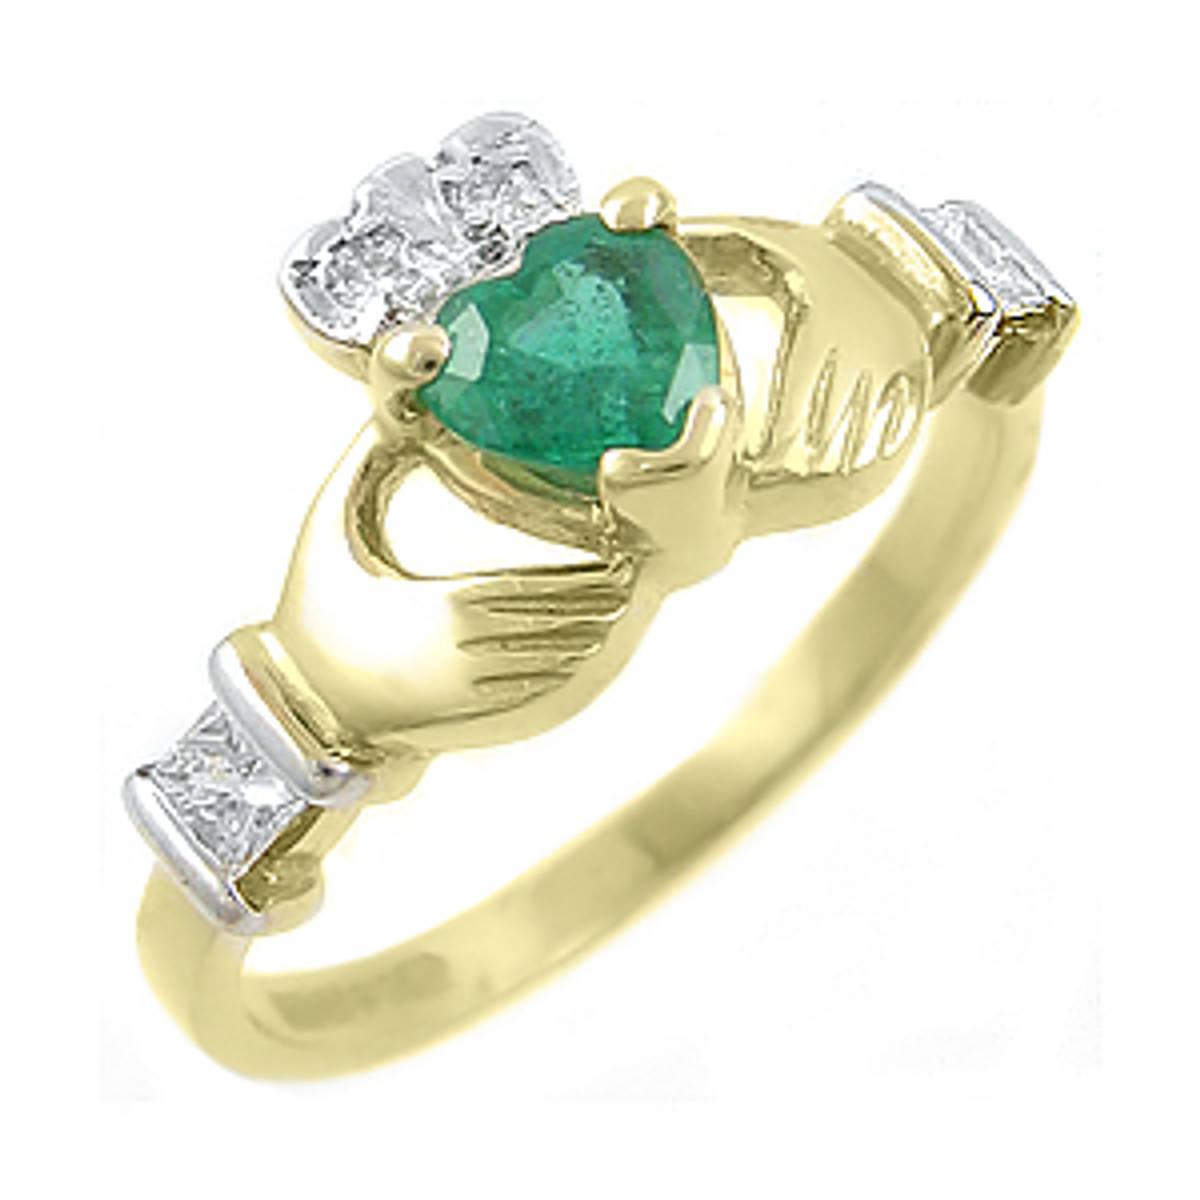 Irish made14 carat yellow gold 0.55cts emerald/0.22cts diamonds claddagh engagement ring